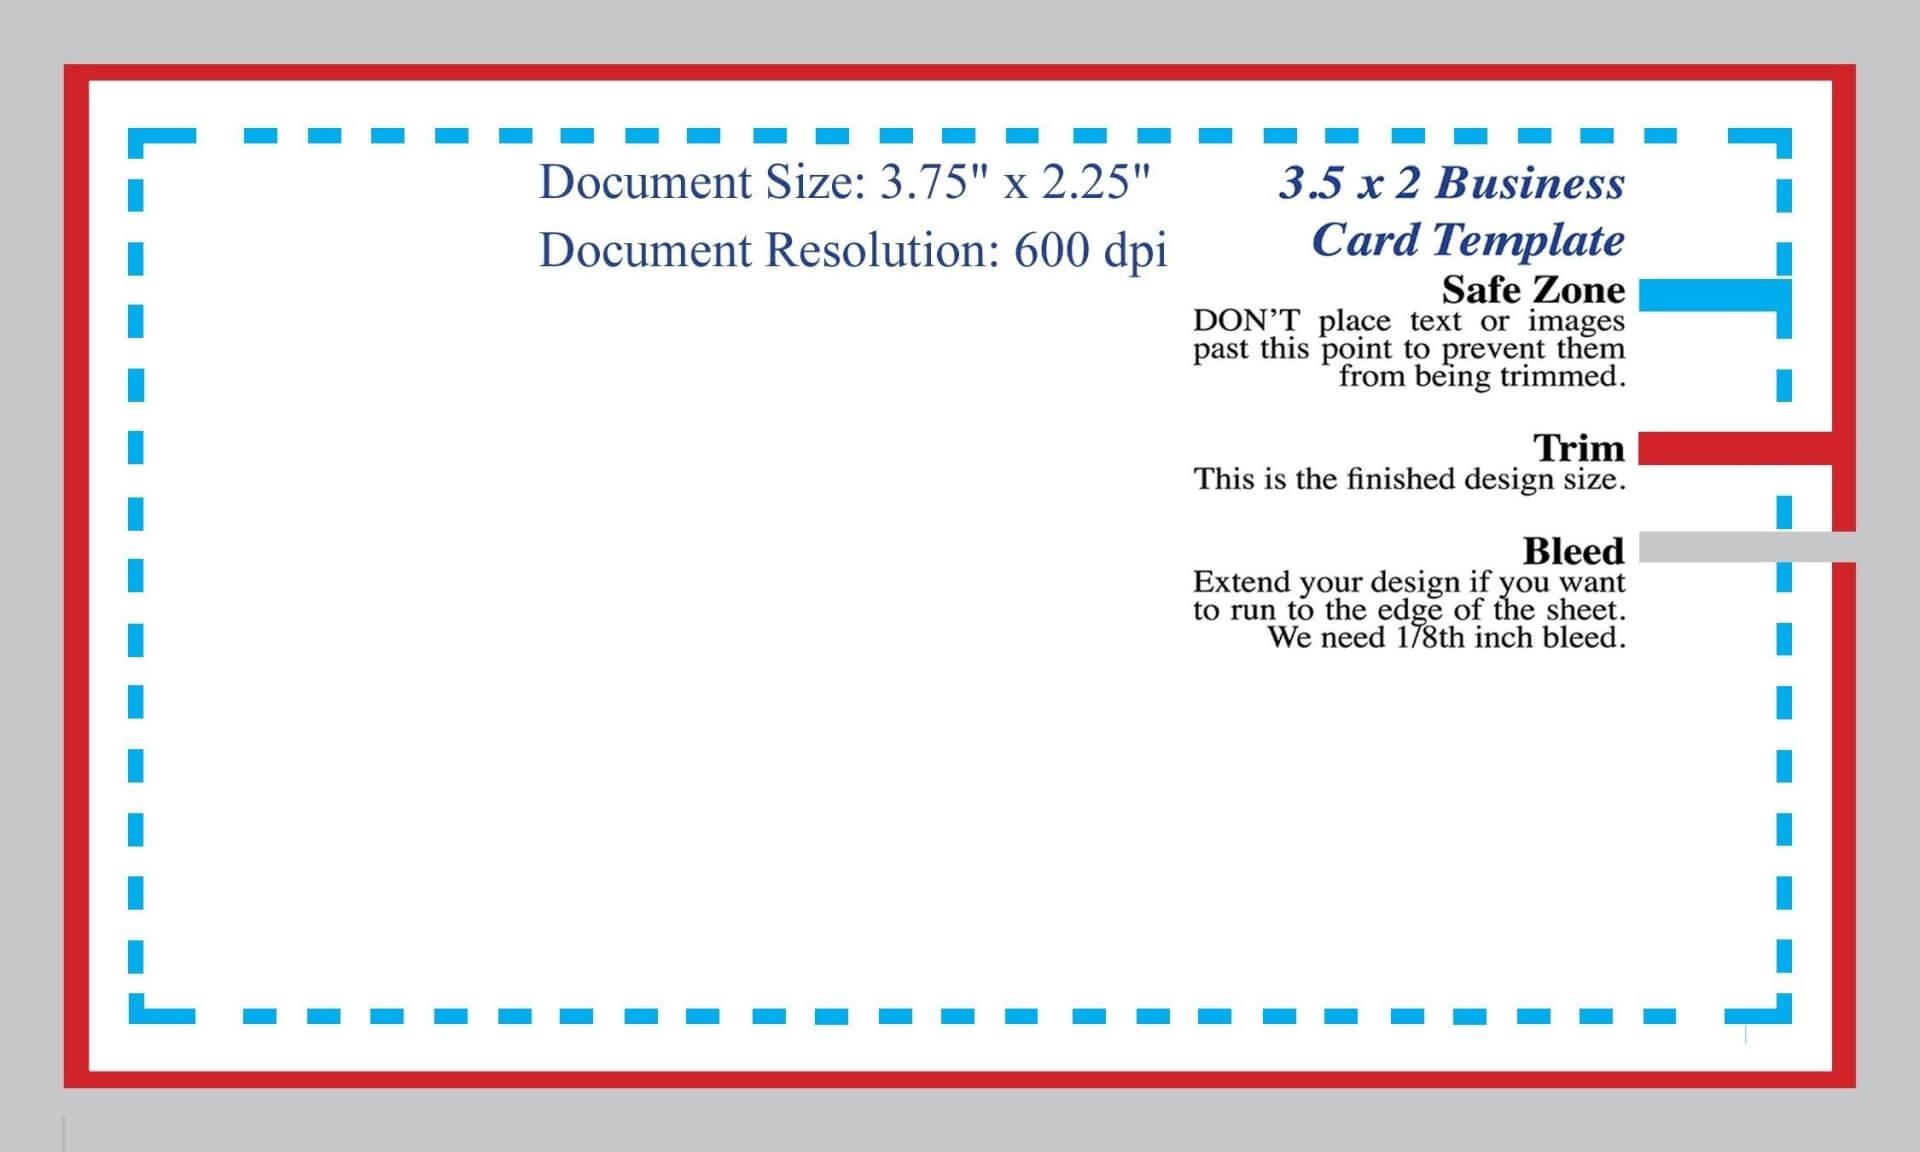 Fantastic Photoshop Business Card Template Ideas Psd With With Business Card Template Size Photoshop